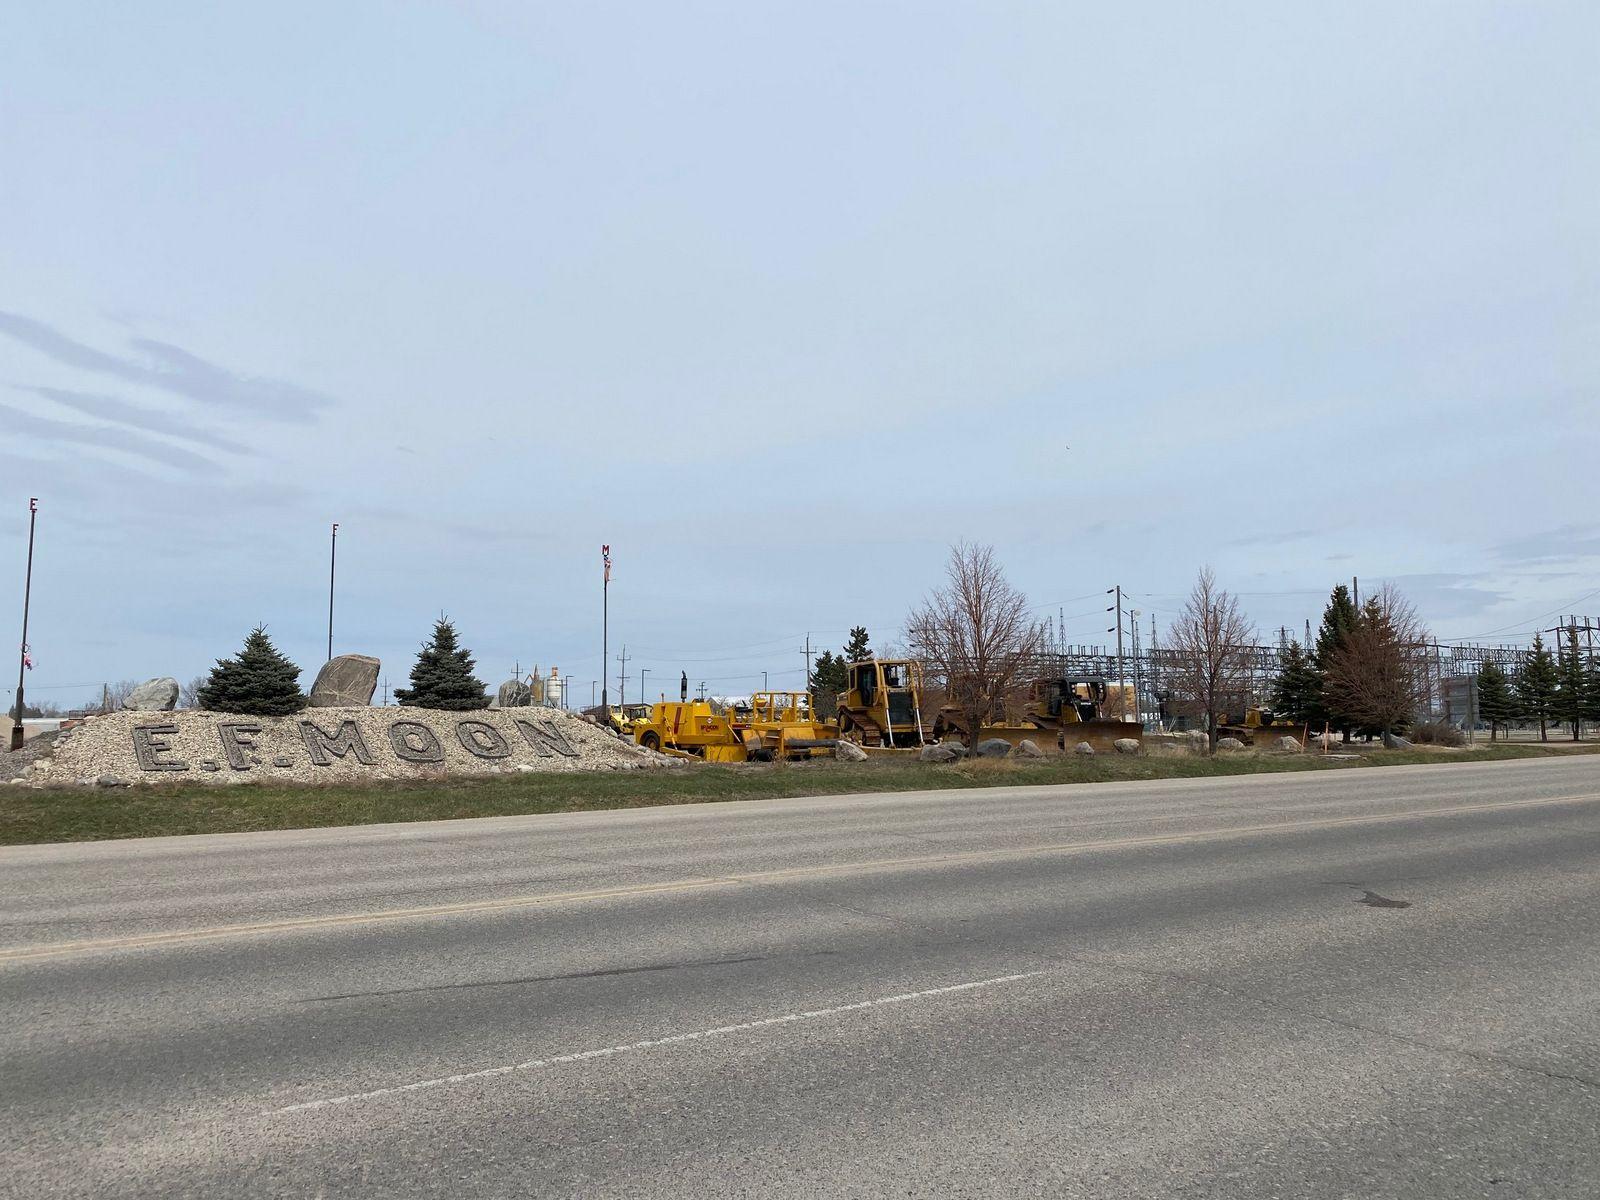 Main Photo: 0 Saskatchewan Avenue E in Portage la Prairie: Vacant Land for sale : MLS®# 202110013